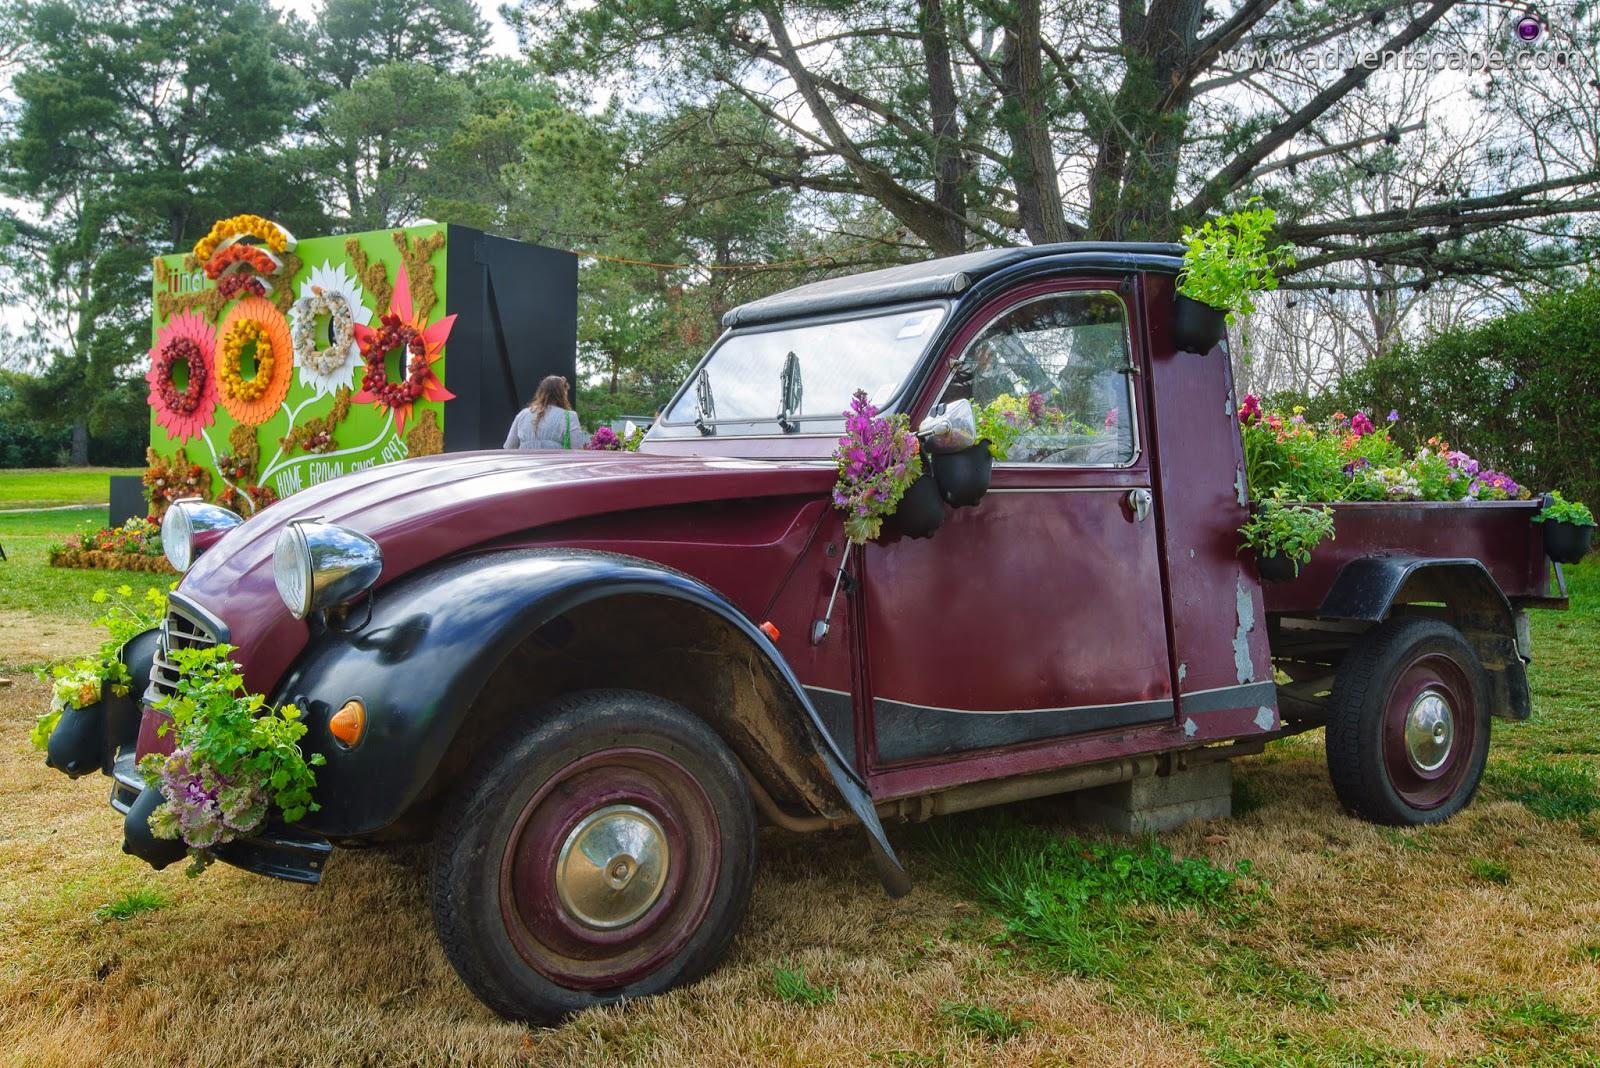 Philip Avellana, iori, advenscape, Floriade, 2014, spring festival, Canberra, ACT, Australian Capital Territory, park, flowers, blossom, car flower